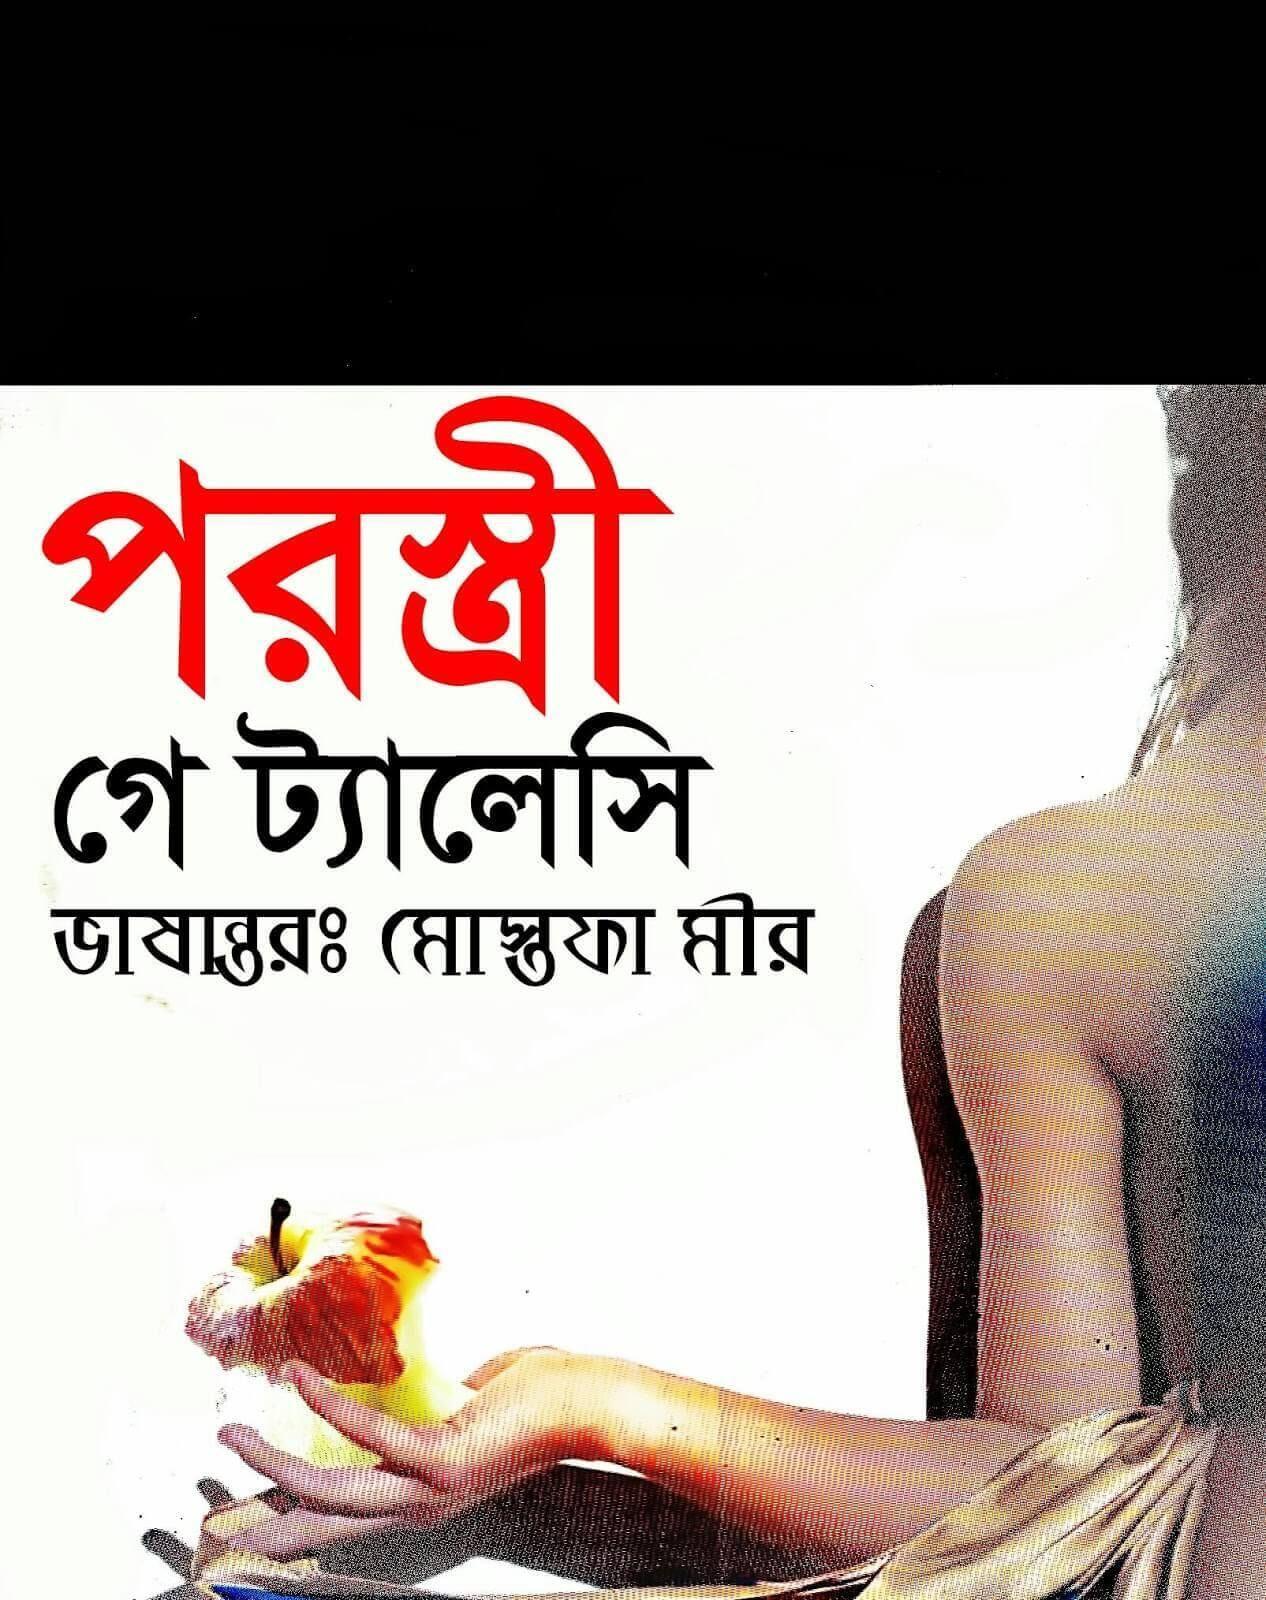 Thy Neighbor's Wife, ���াংলা ���নুবাদ, Gay Talese, Mostofa Mir, ���রস্ত্রী, ���ে